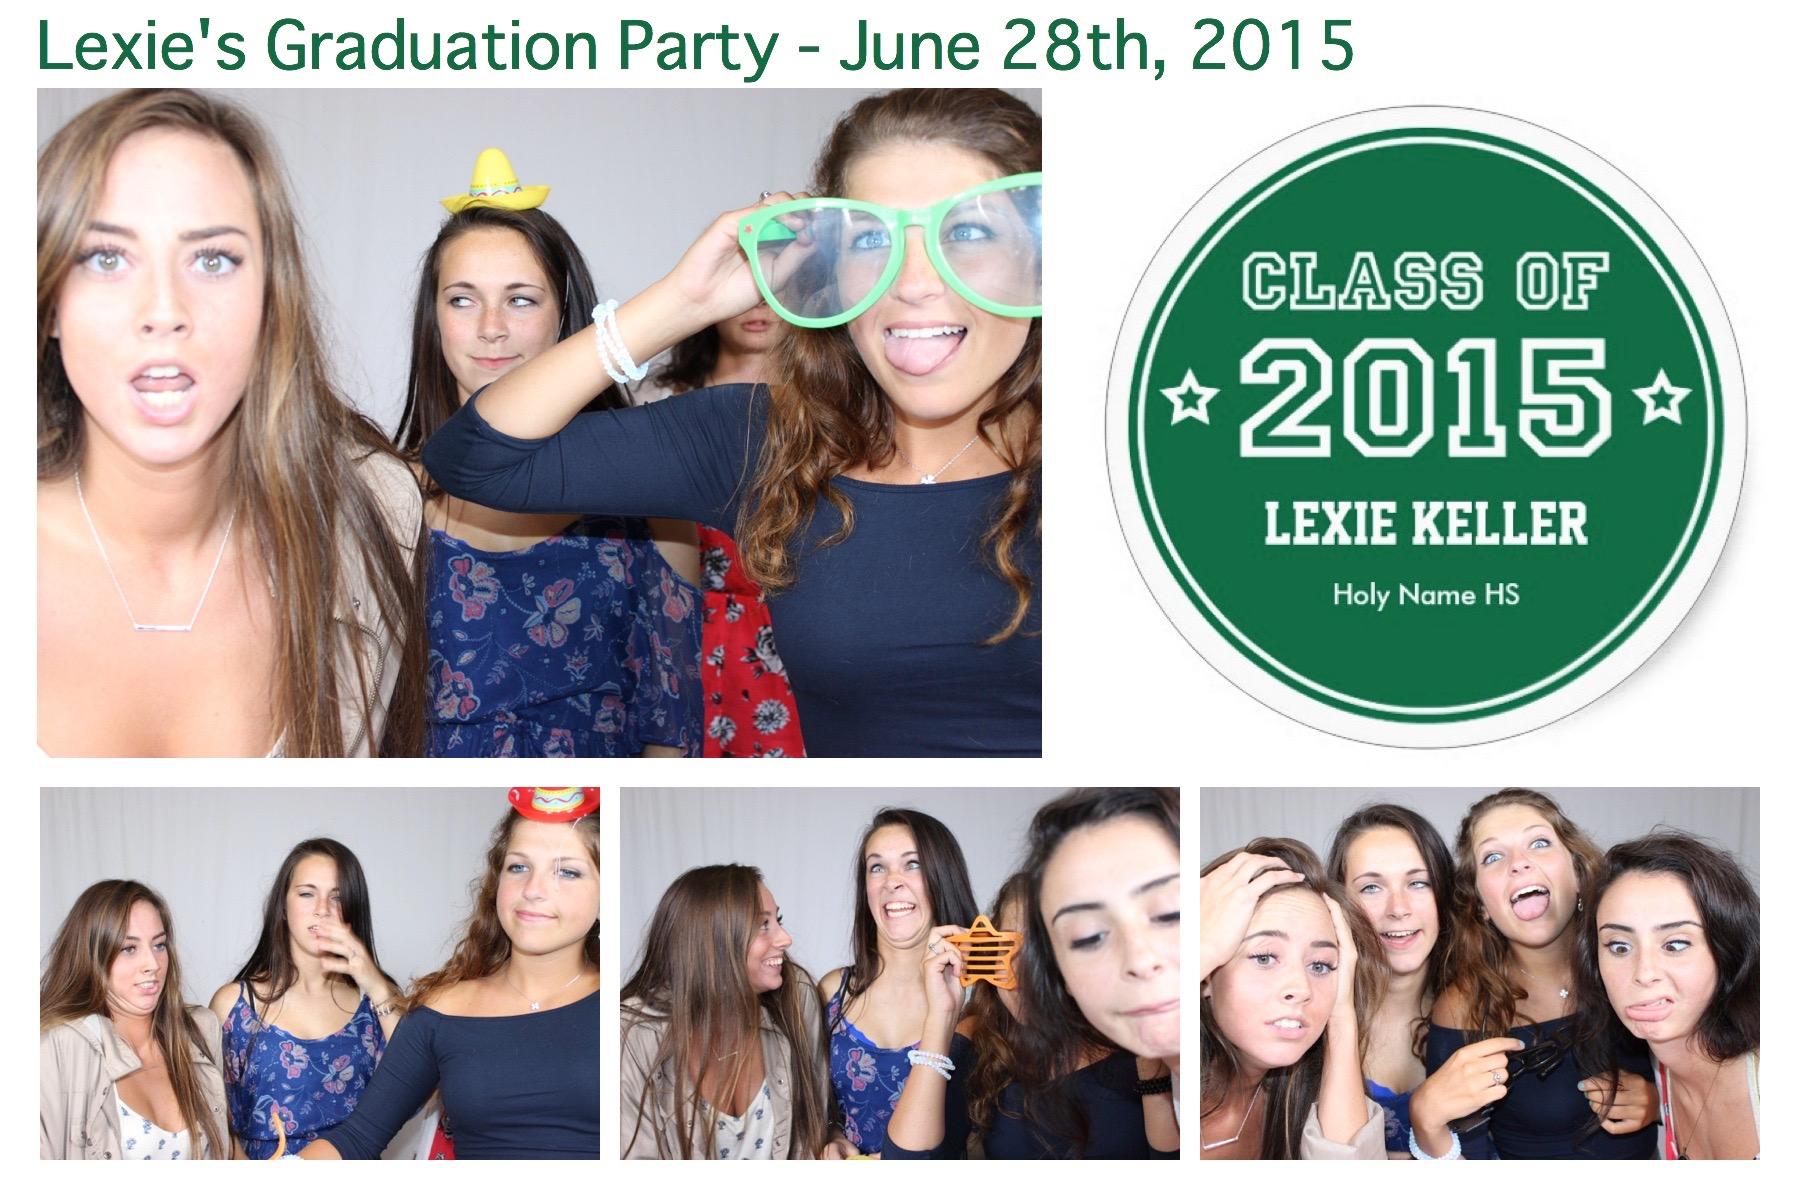 00066-Social+Booth+NorthRidgeville+Graduation